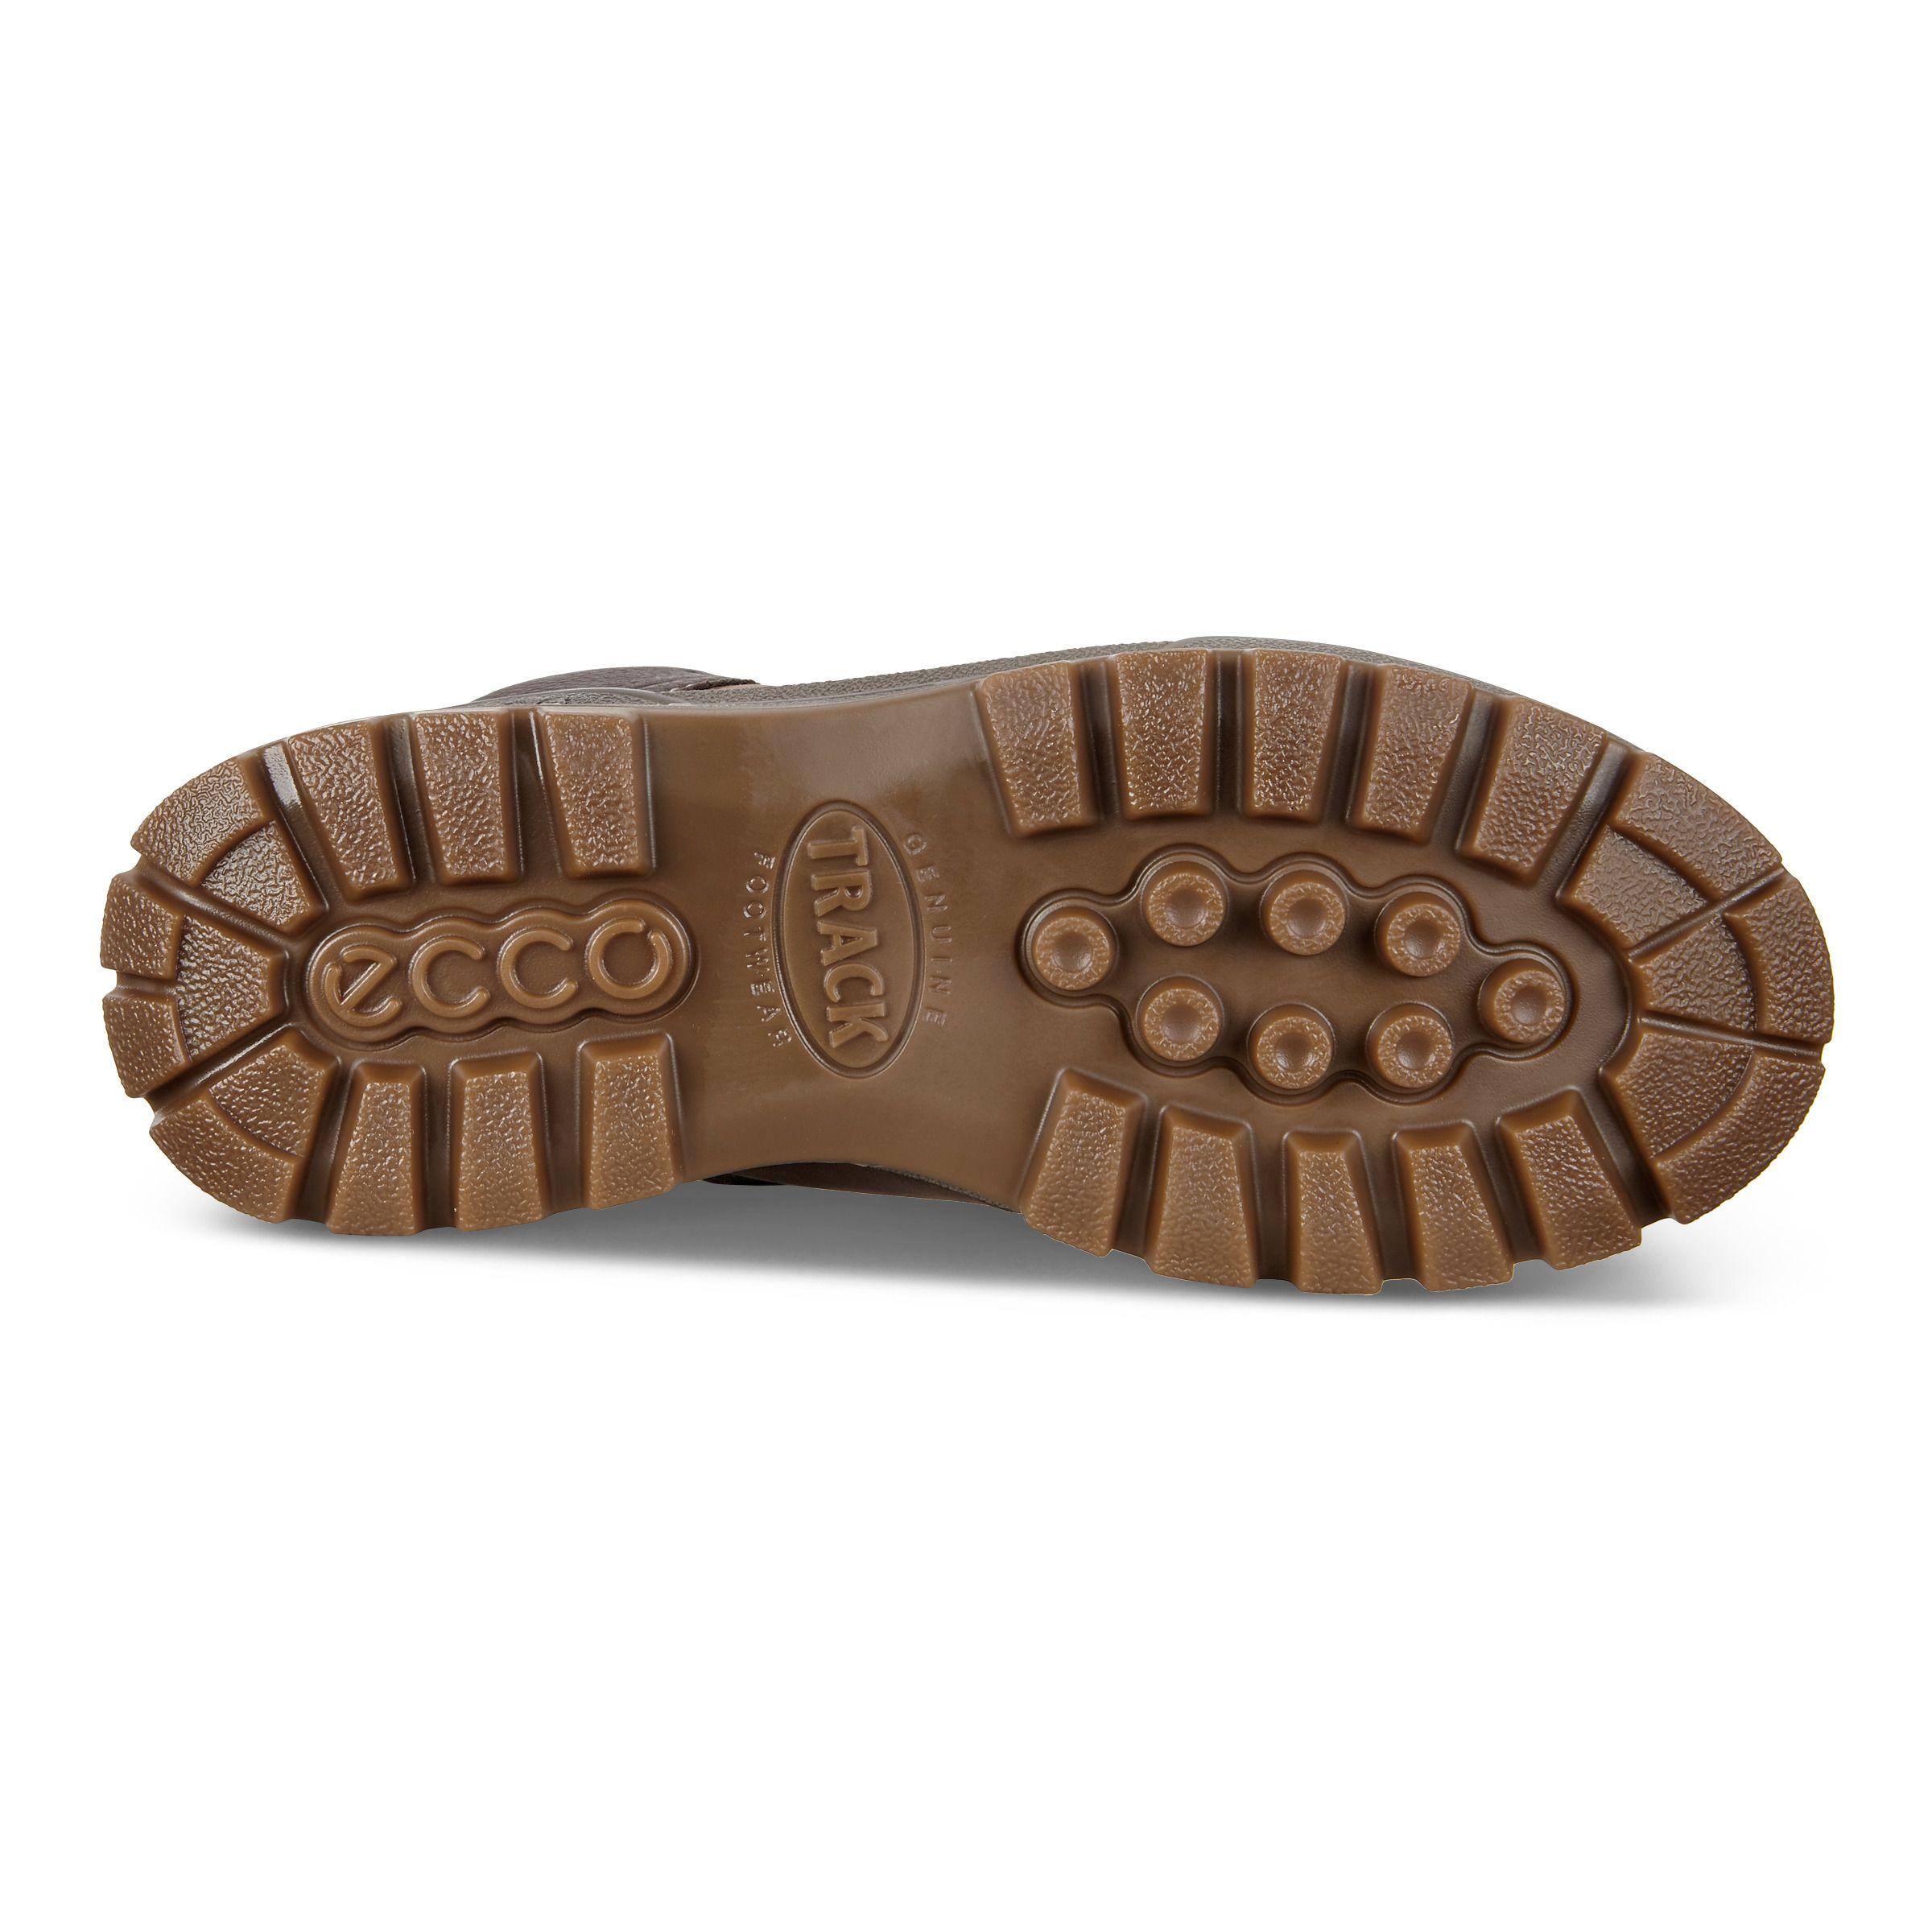 Choose SZColor ECCO Men's Track 25 Hydromax Hiking Shoe